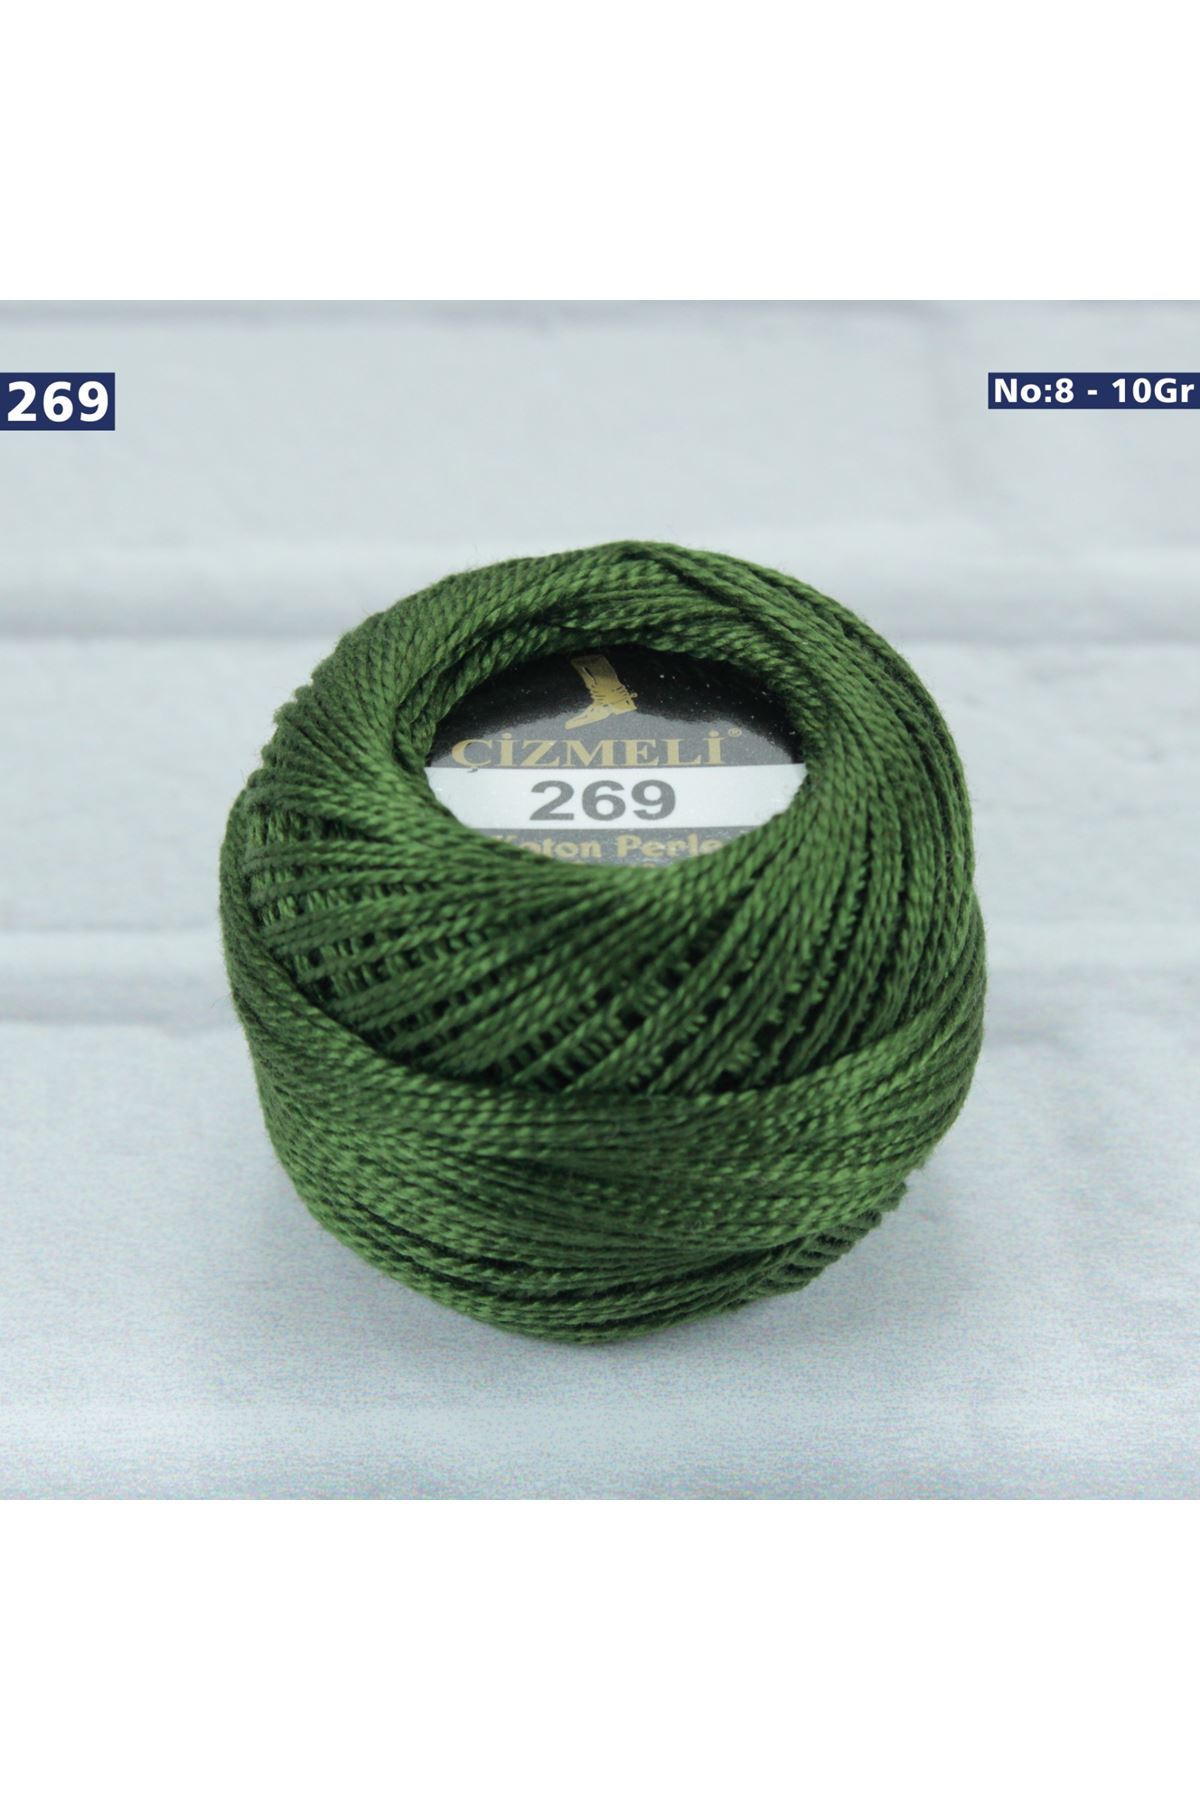 Çizmeli Cotton Perle Nakış İpliği No: 269